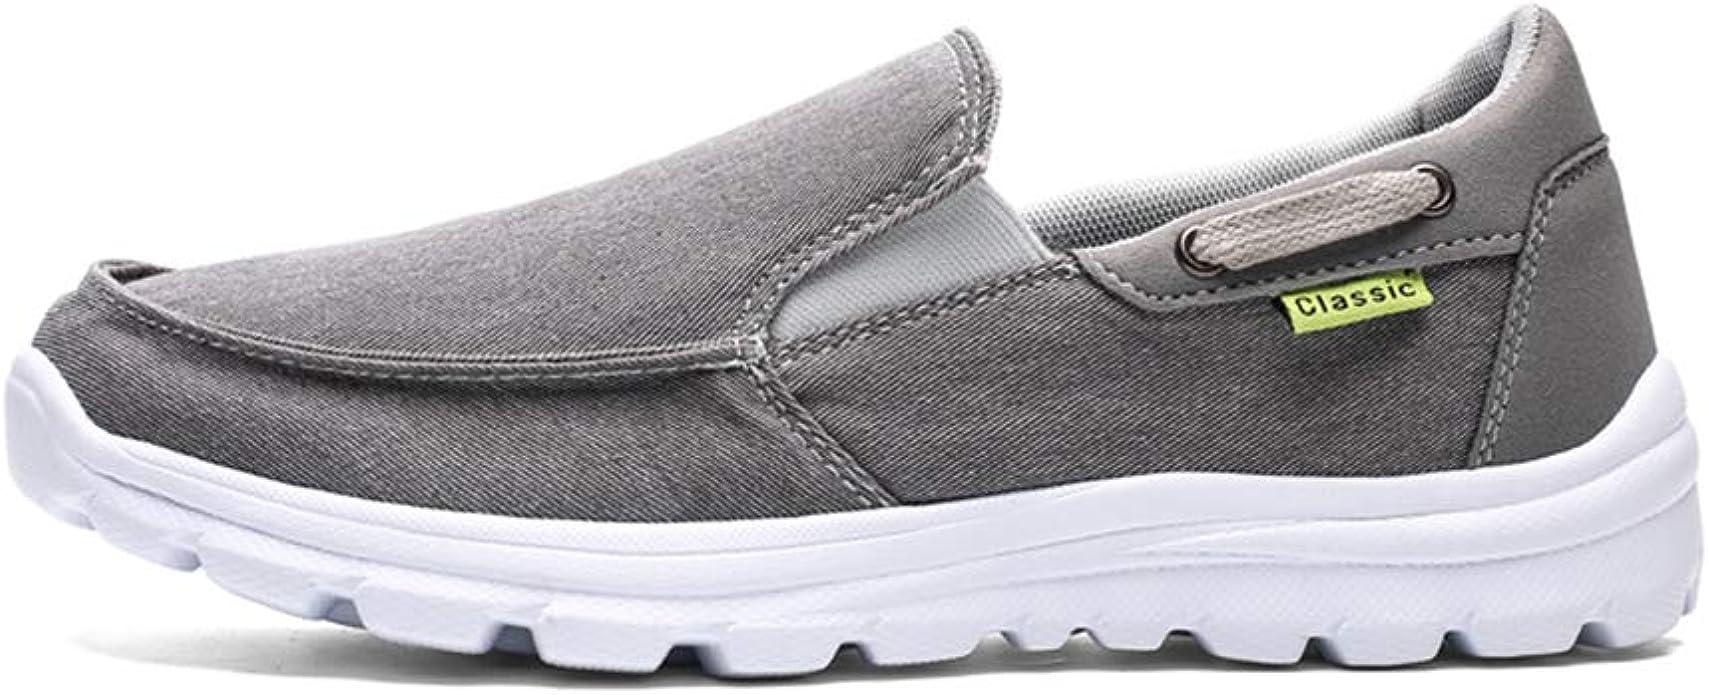 Amazon.com: bo li xuan Deck Zapatos para hombre Boat Zapato ...